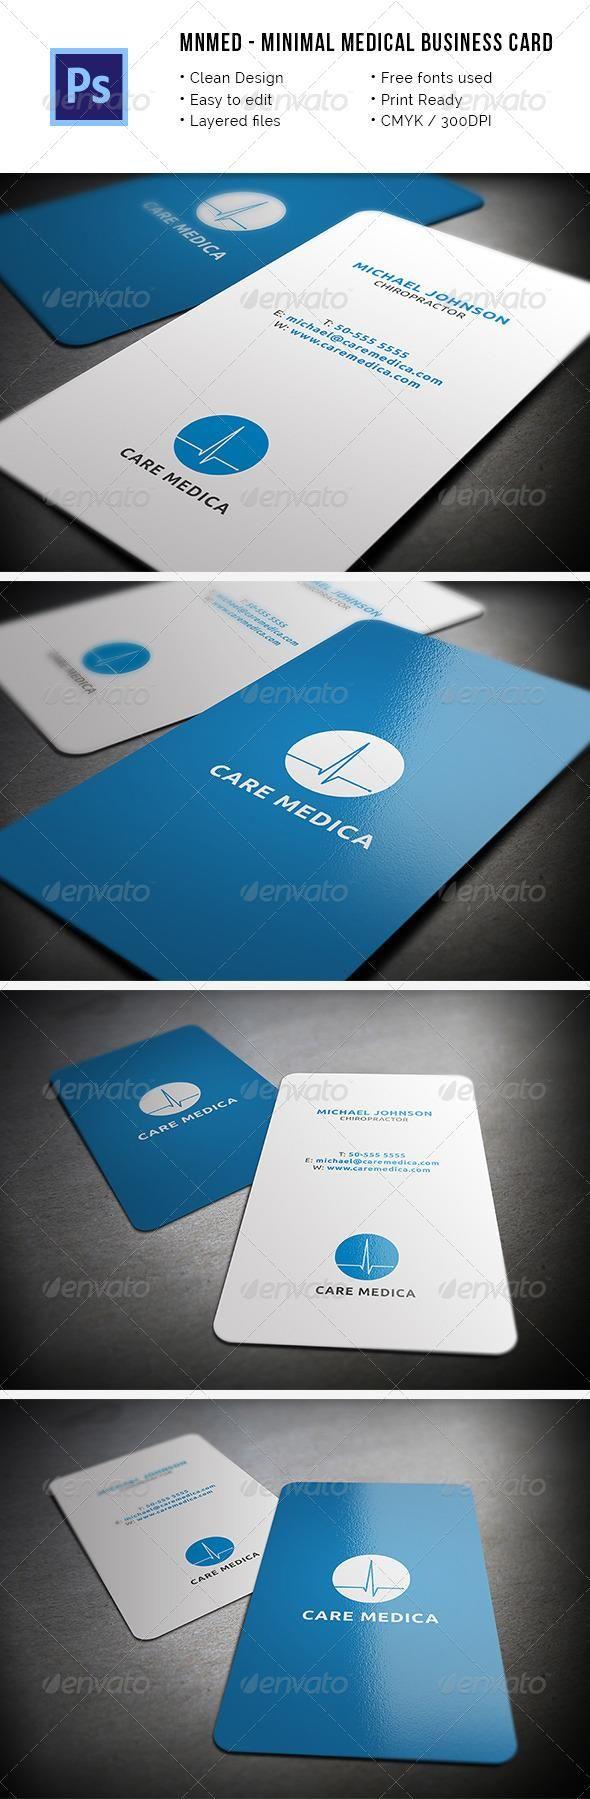 MnMed - Minimal Medical Business Card